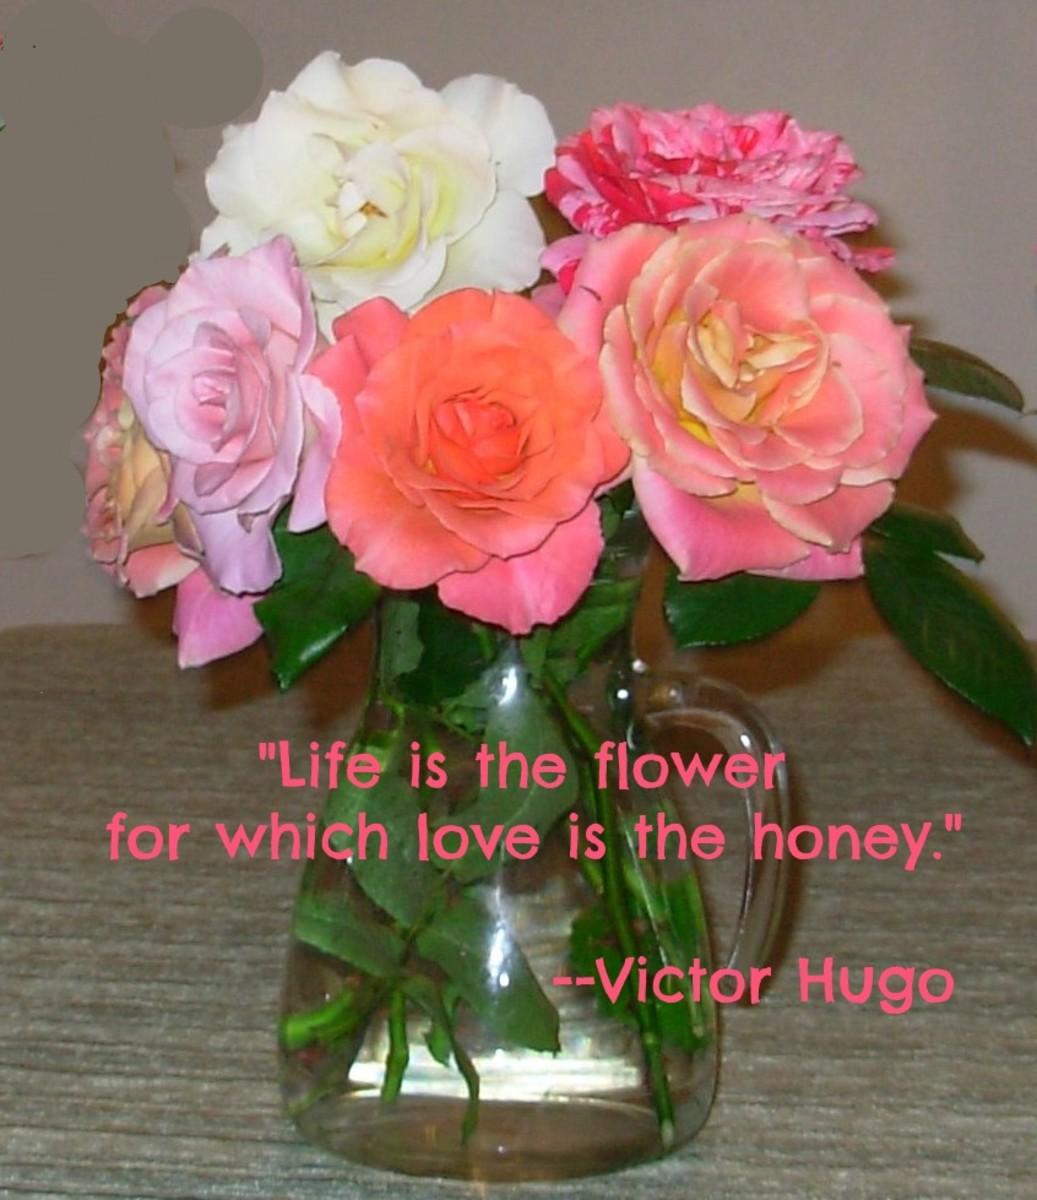 Love adds sweetness to life.